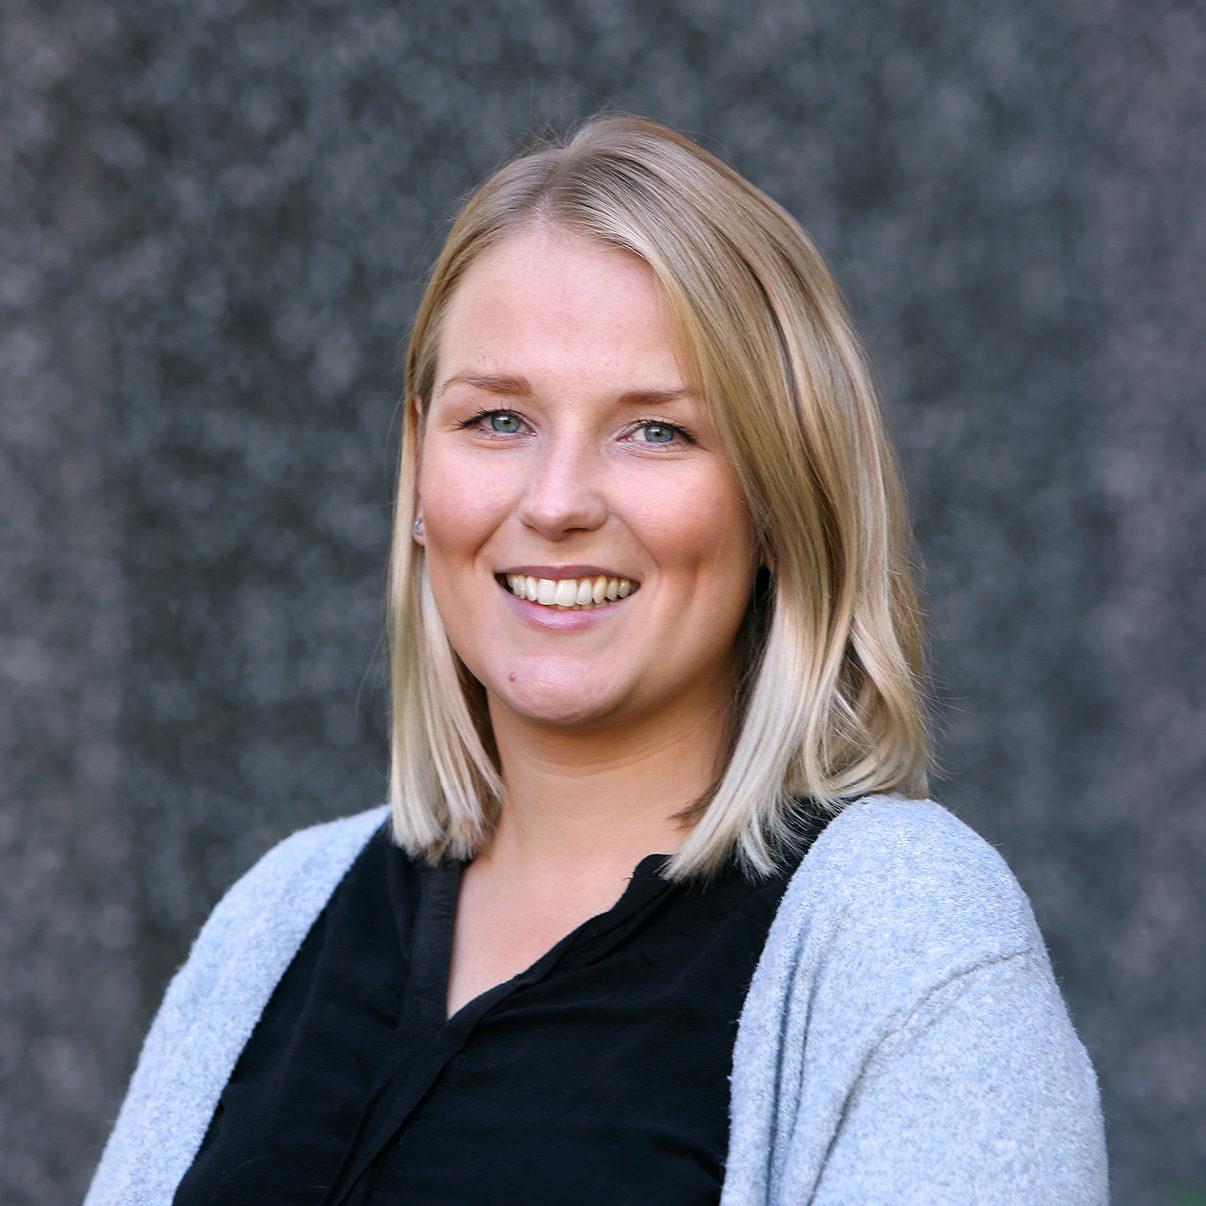 Stella Lindfors